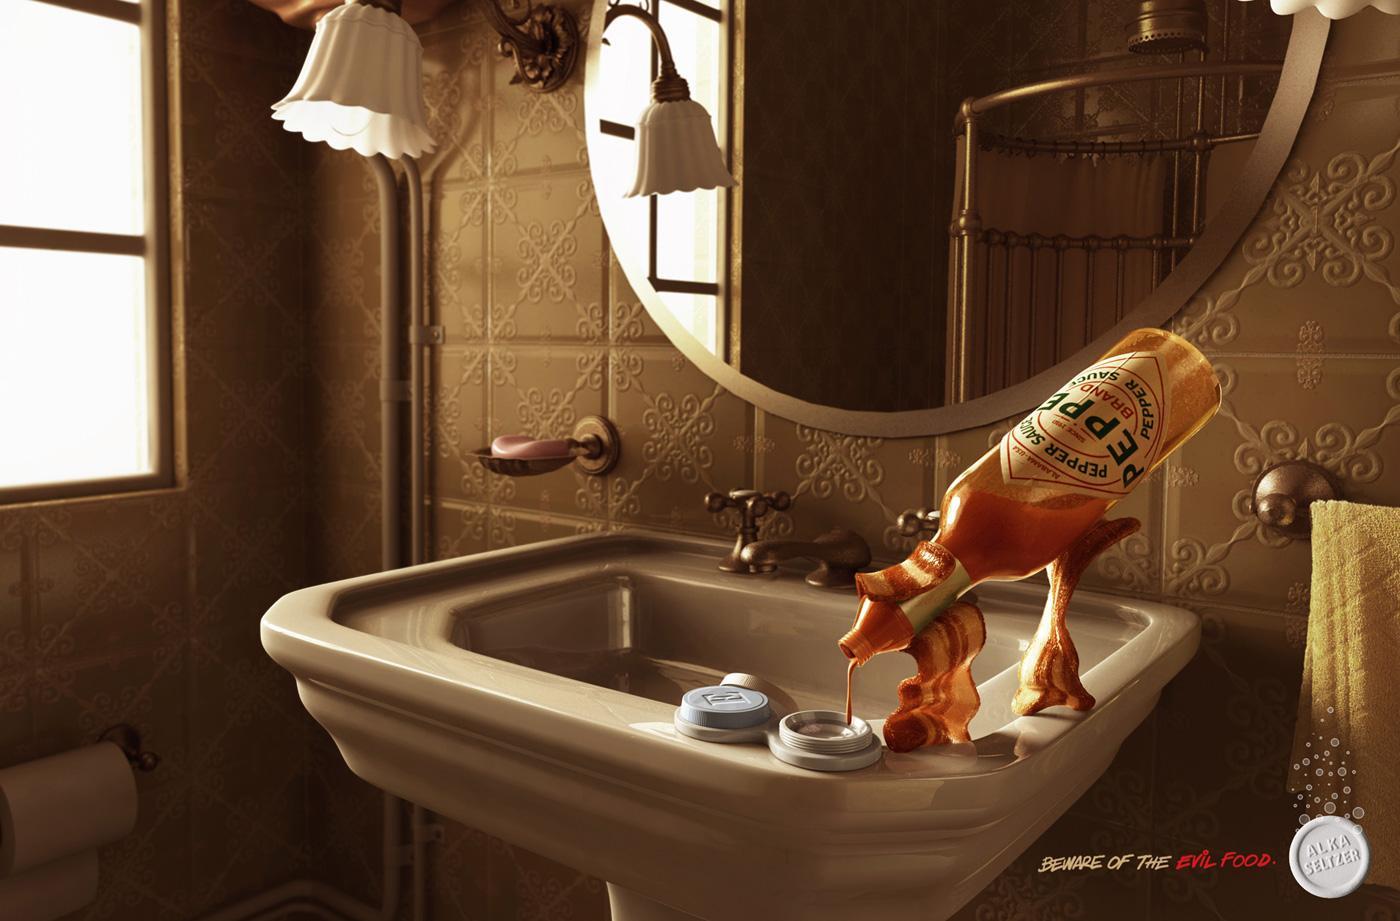 Alka Seltzer Print Ad -  Beware of the evil food, Bacon